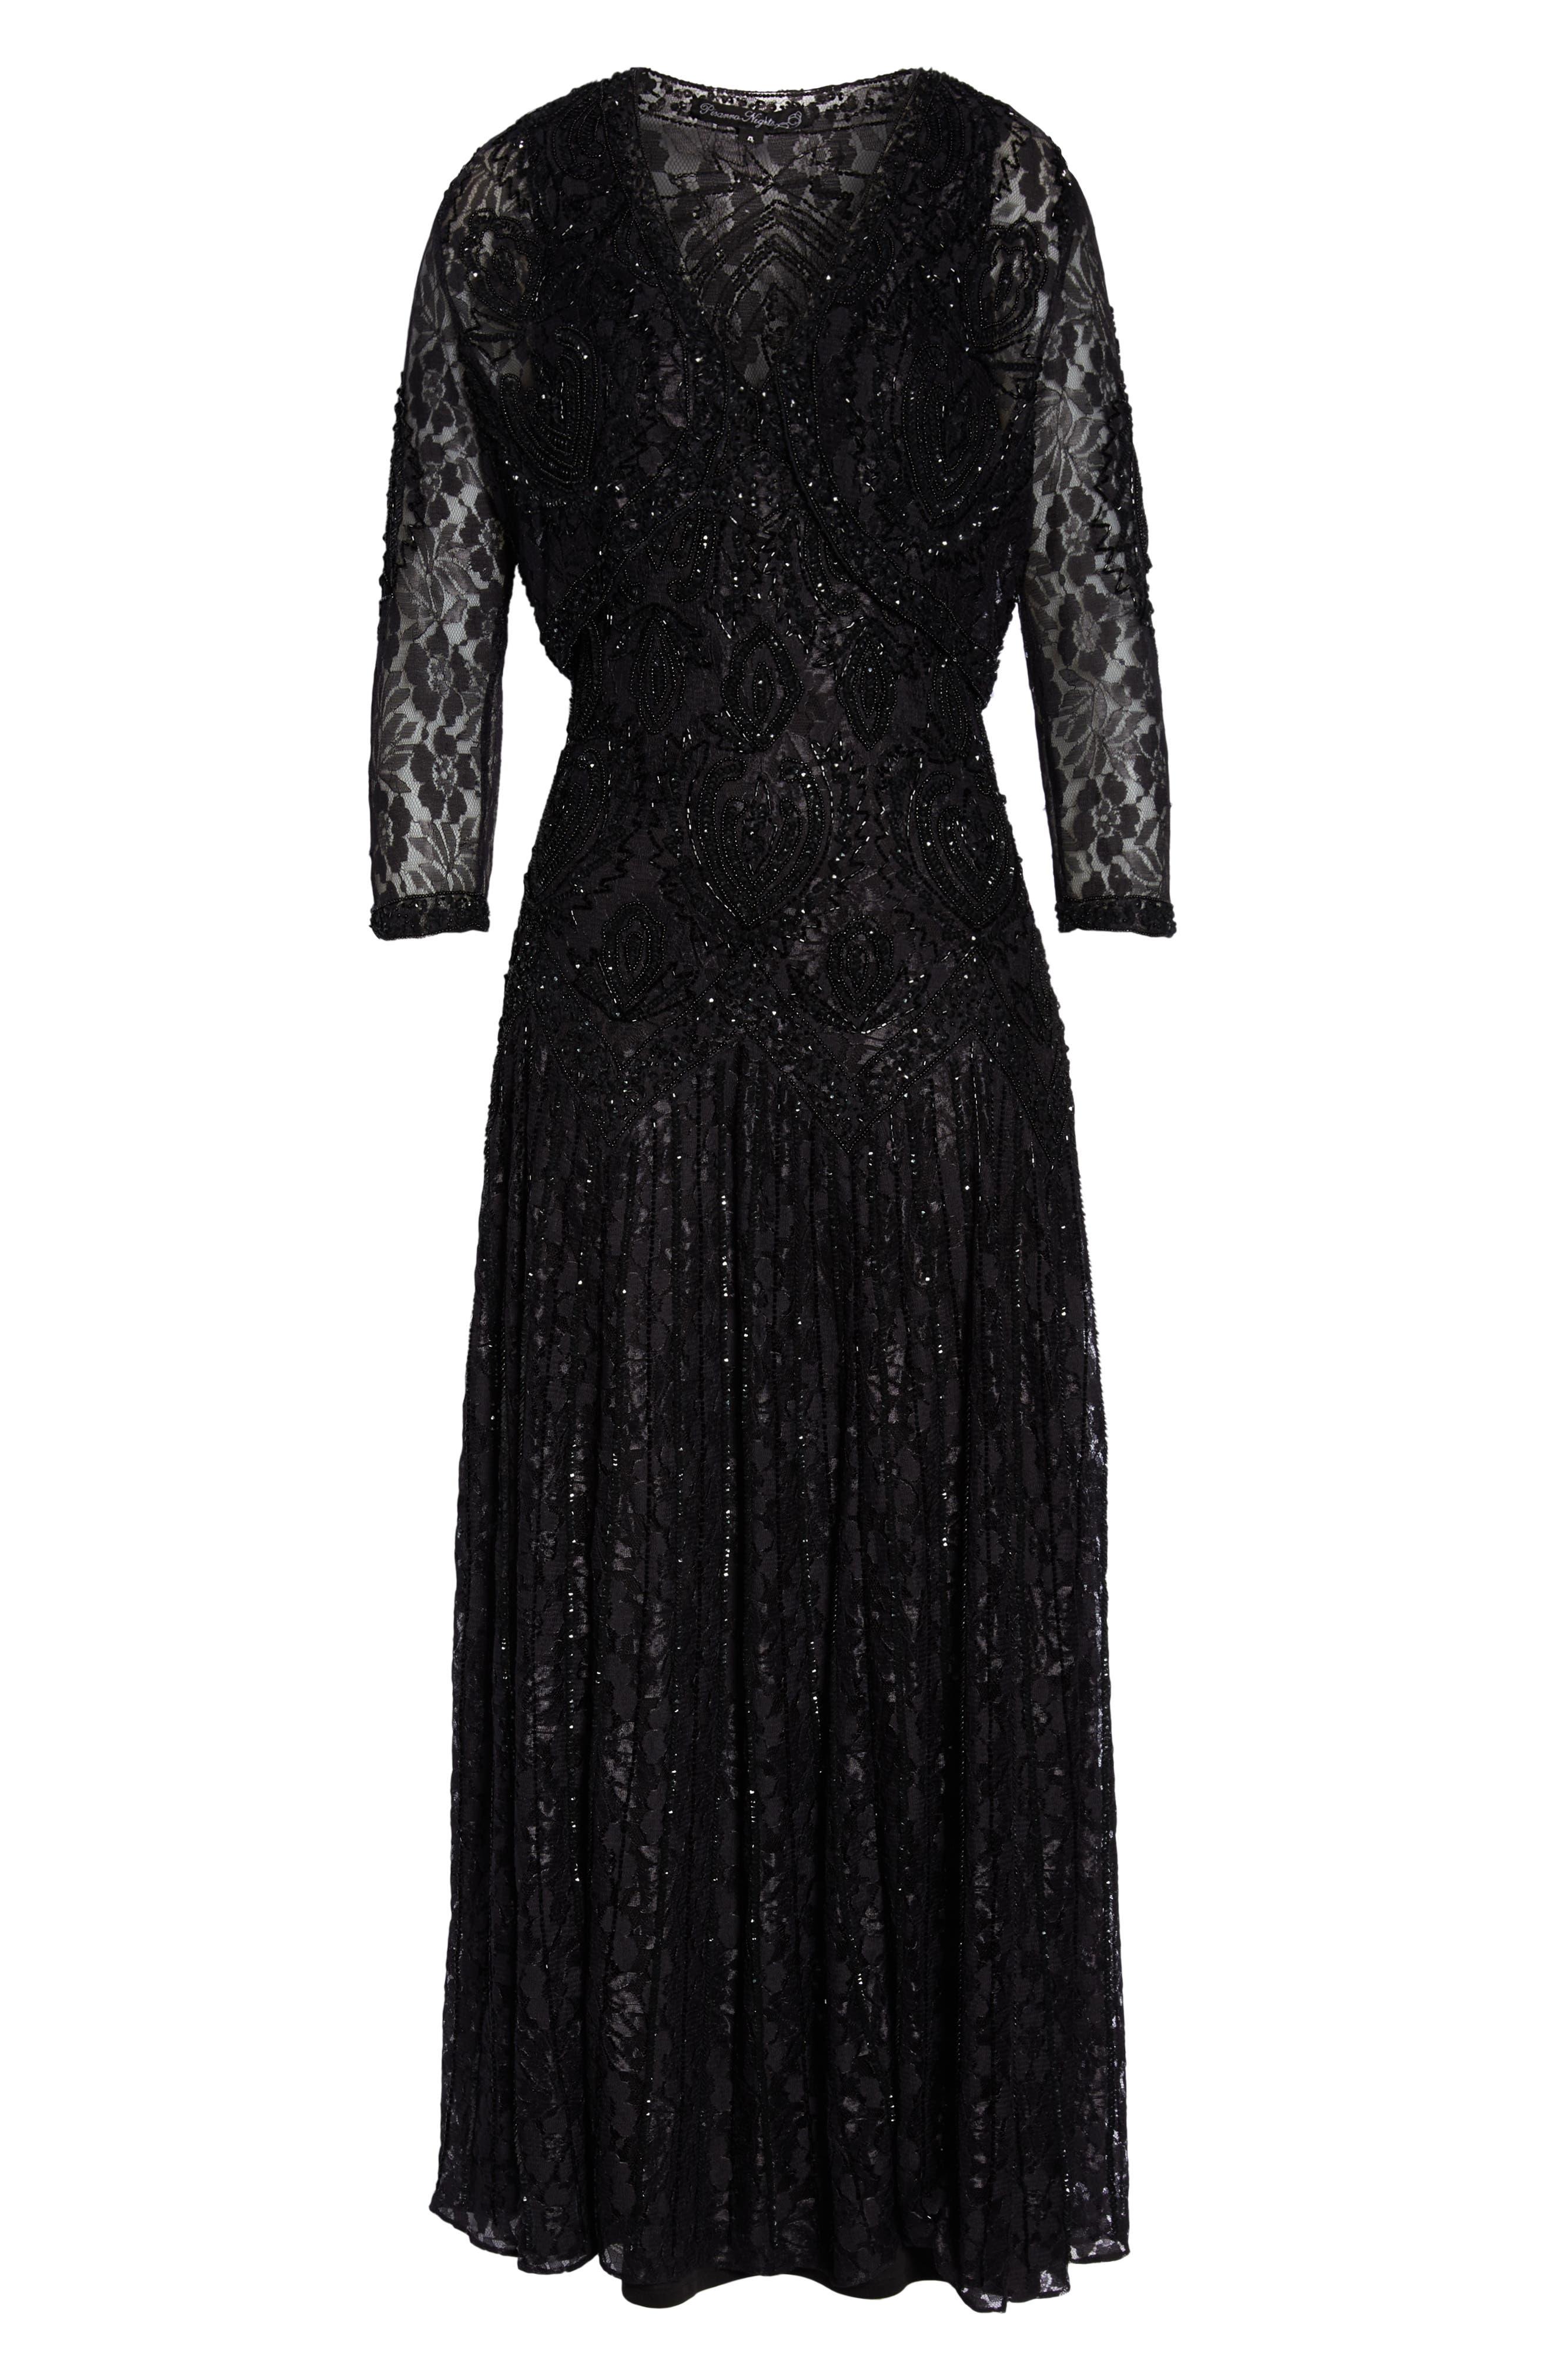 PISARRO NIGHTS, Beaded Lace Evening Dress with Bolero, Alternate thumbnail 7, color, BLACK